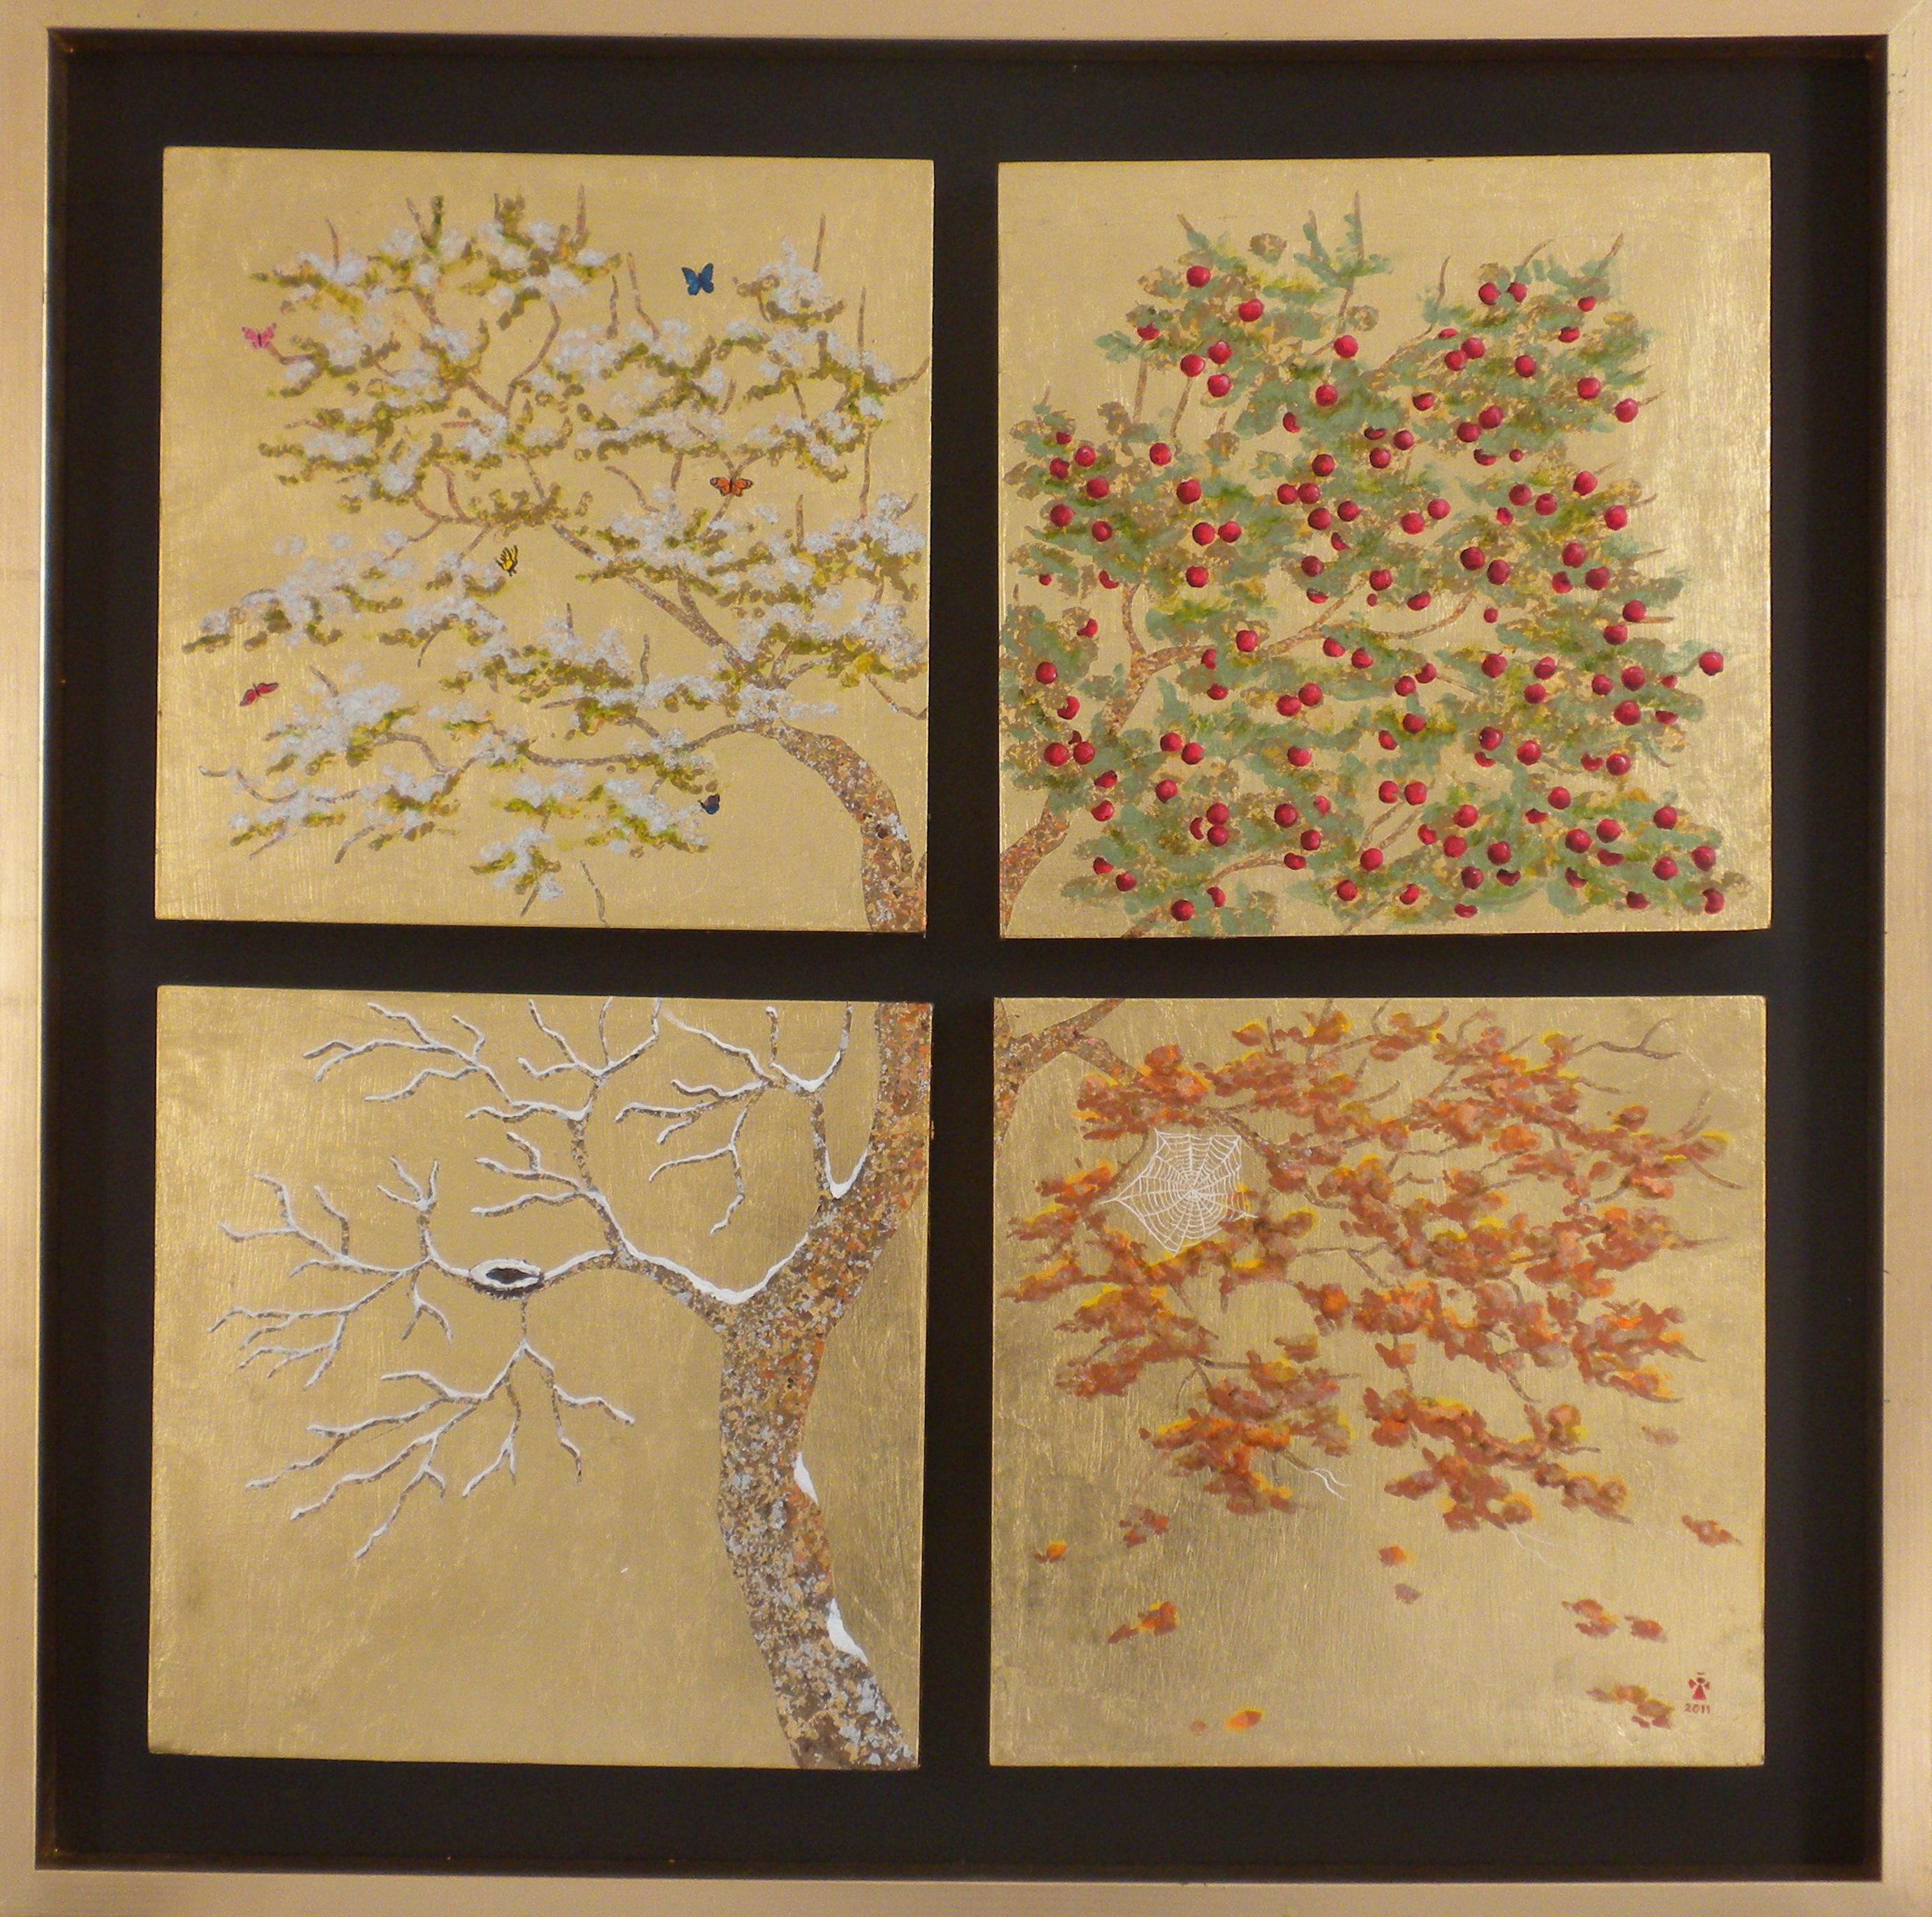 Four Seasons - Angeles Salinas - 19'' x 19'' - Mixed Media on Wood